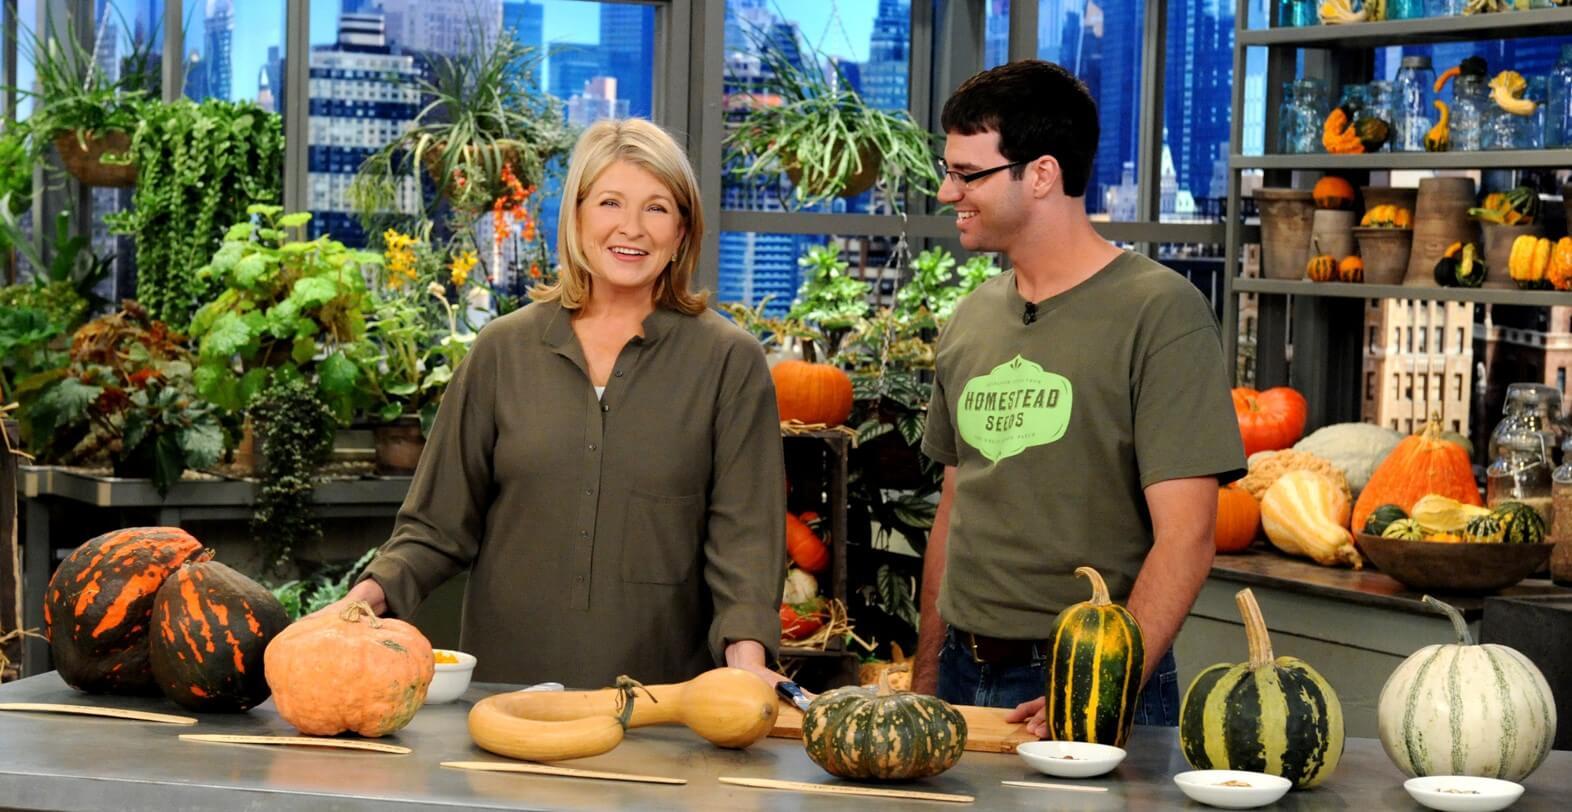 The Great Pumpkin Patch - Arthur, Illinois - Branding - Martha Stewart